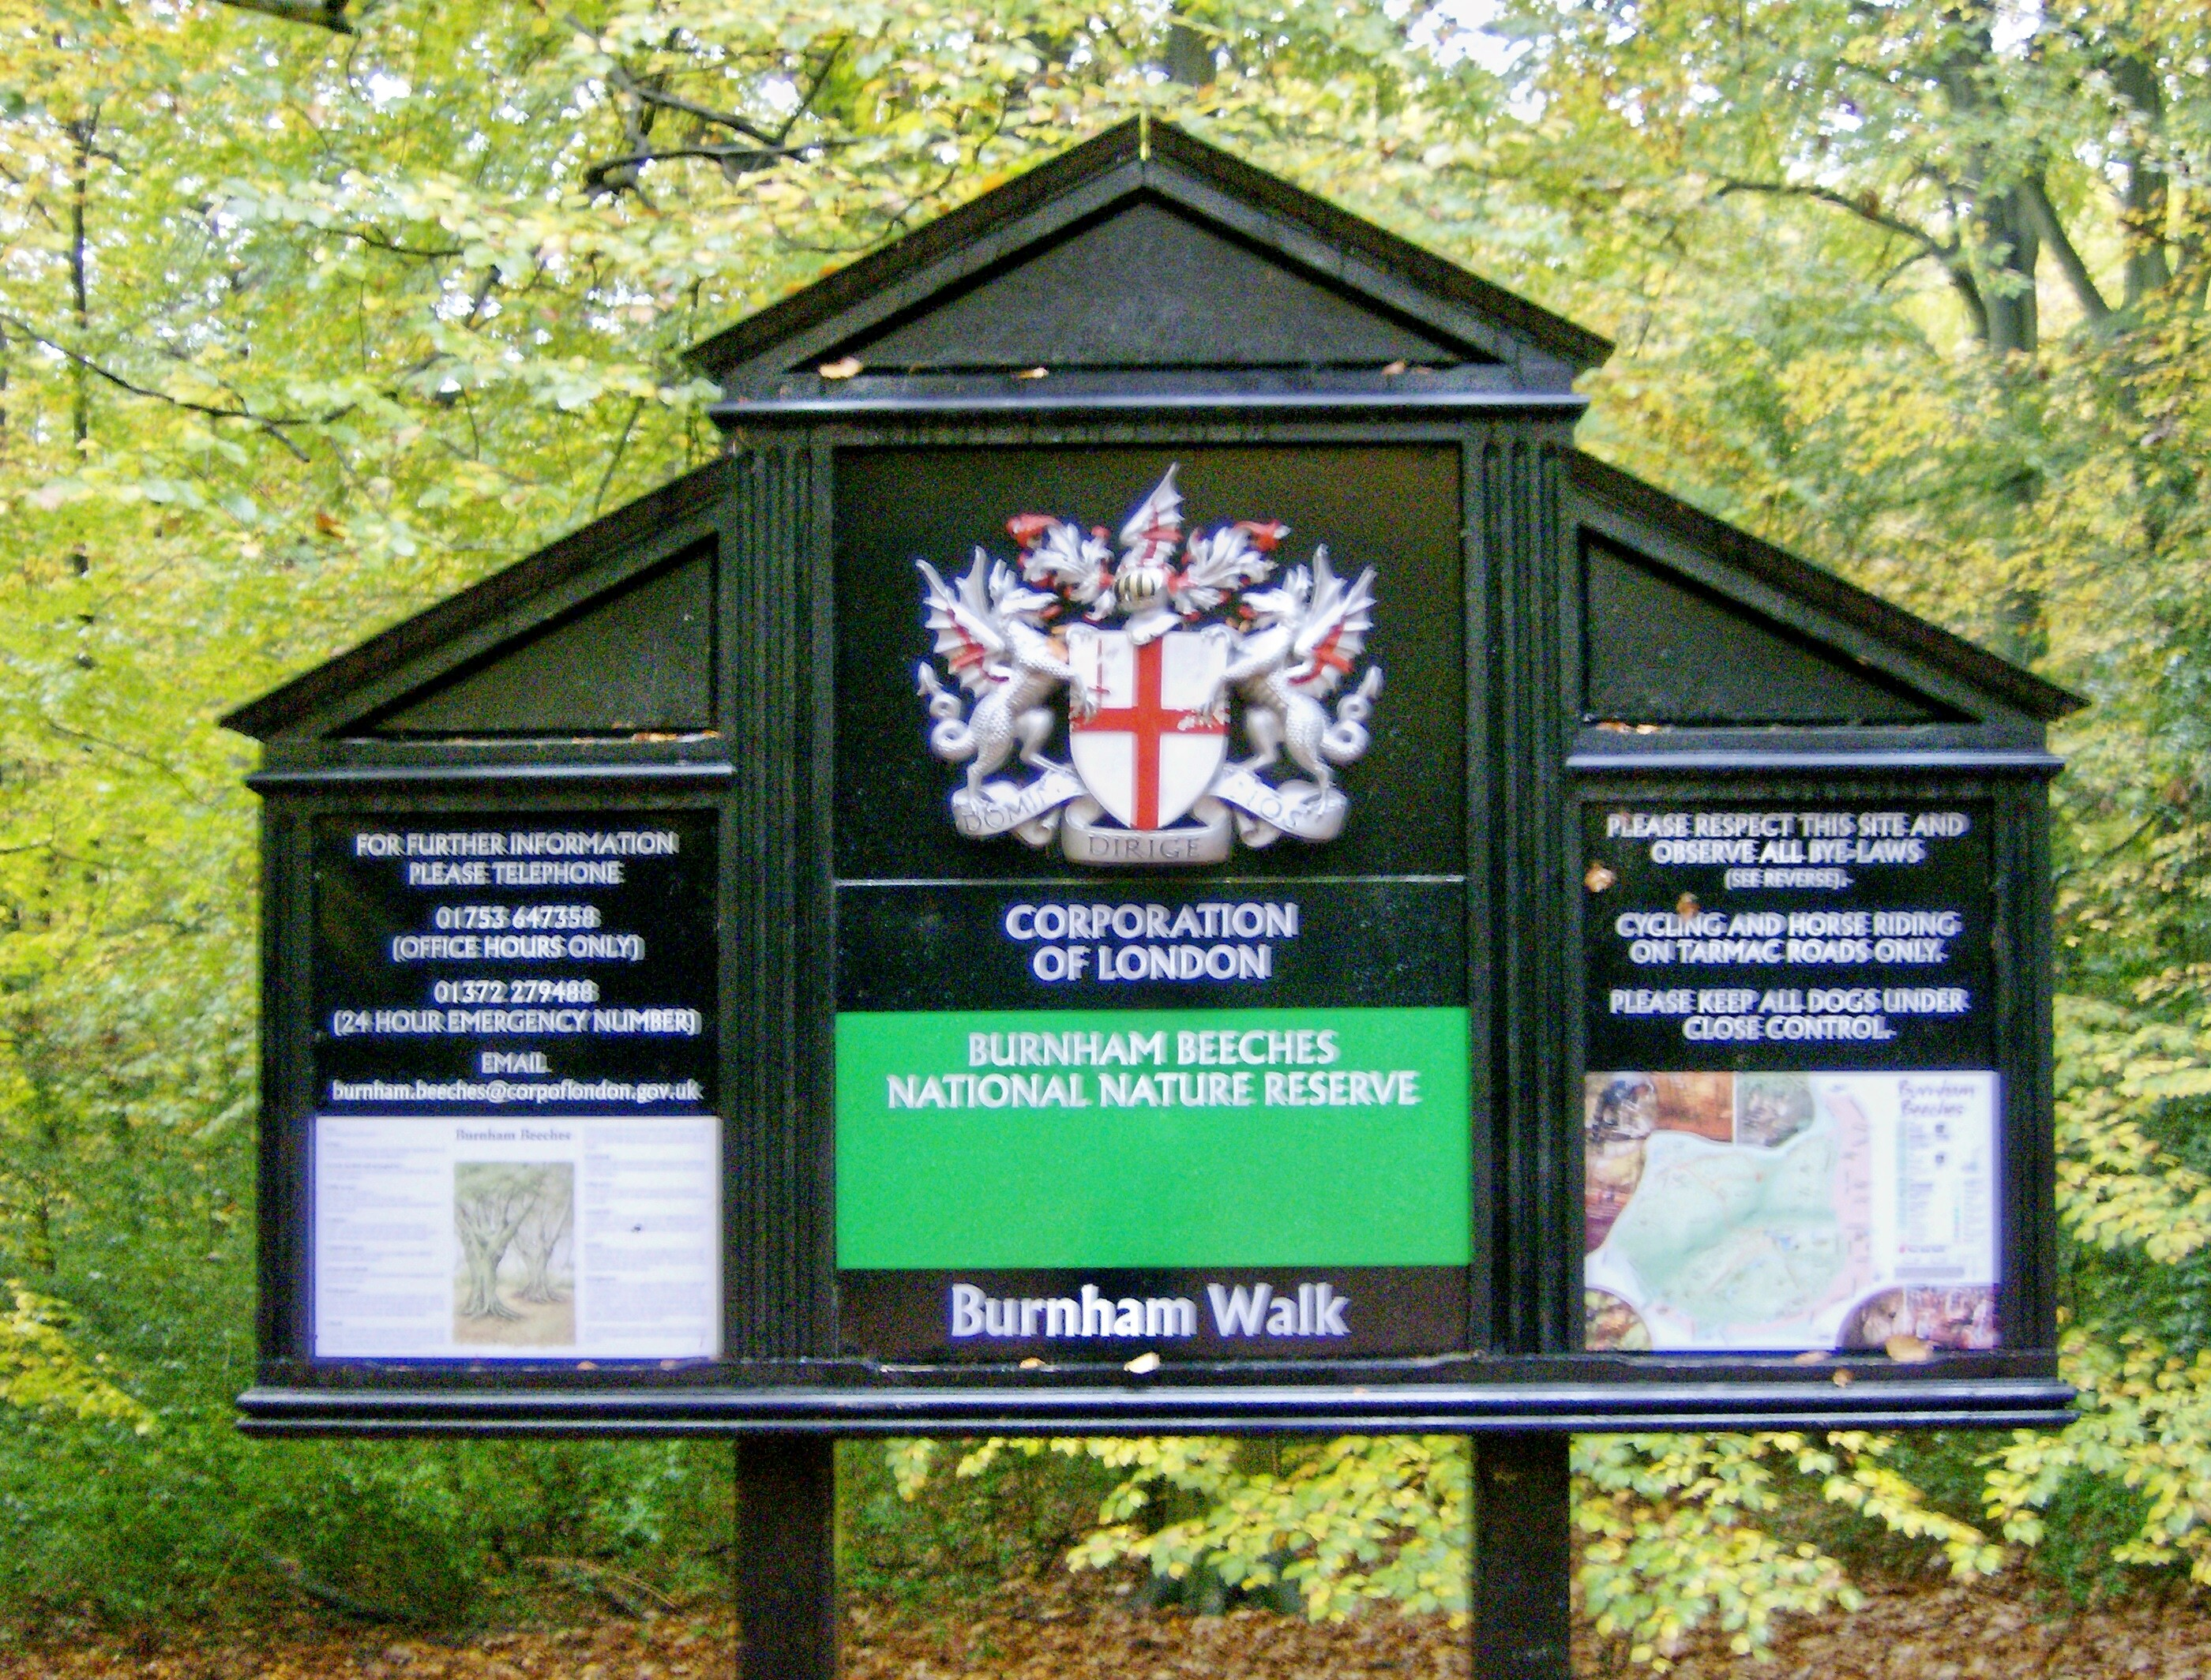 Burnham_Beeches_Sign.JPG